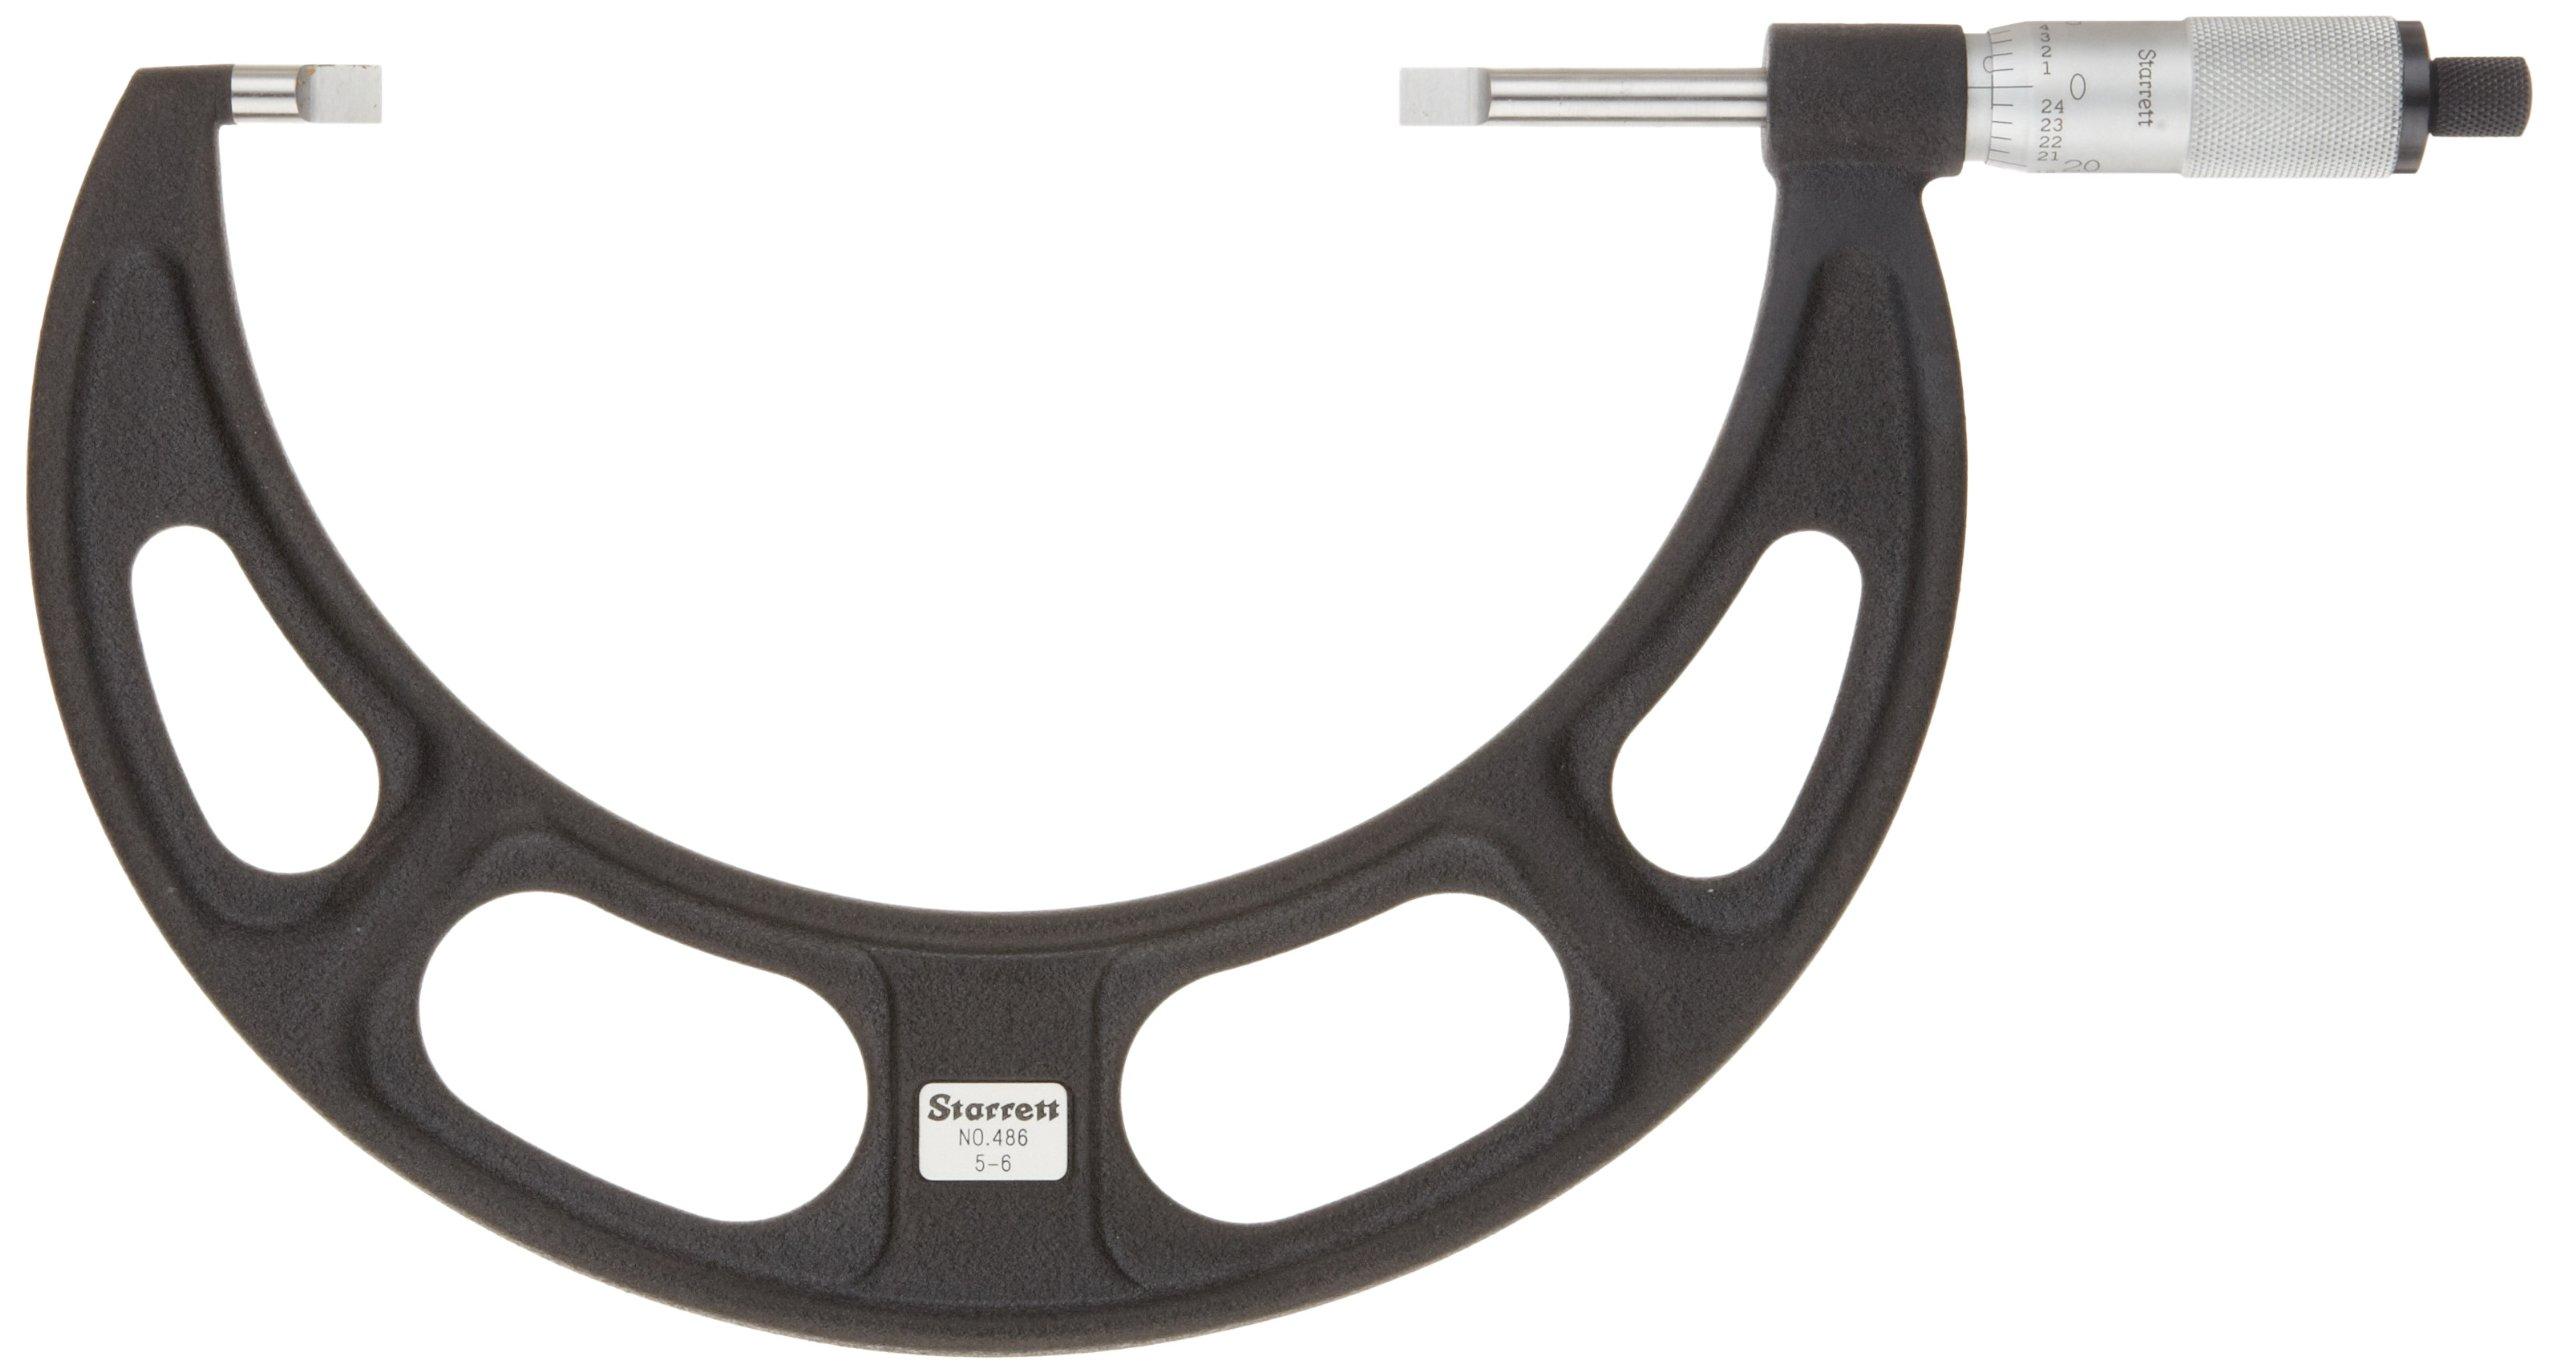 Starrett 486P-8 Blade-Type Micrometer, Non-Rotating Spindle, Plain Thimble, 7-8'' Range, 0.001'' Graduation